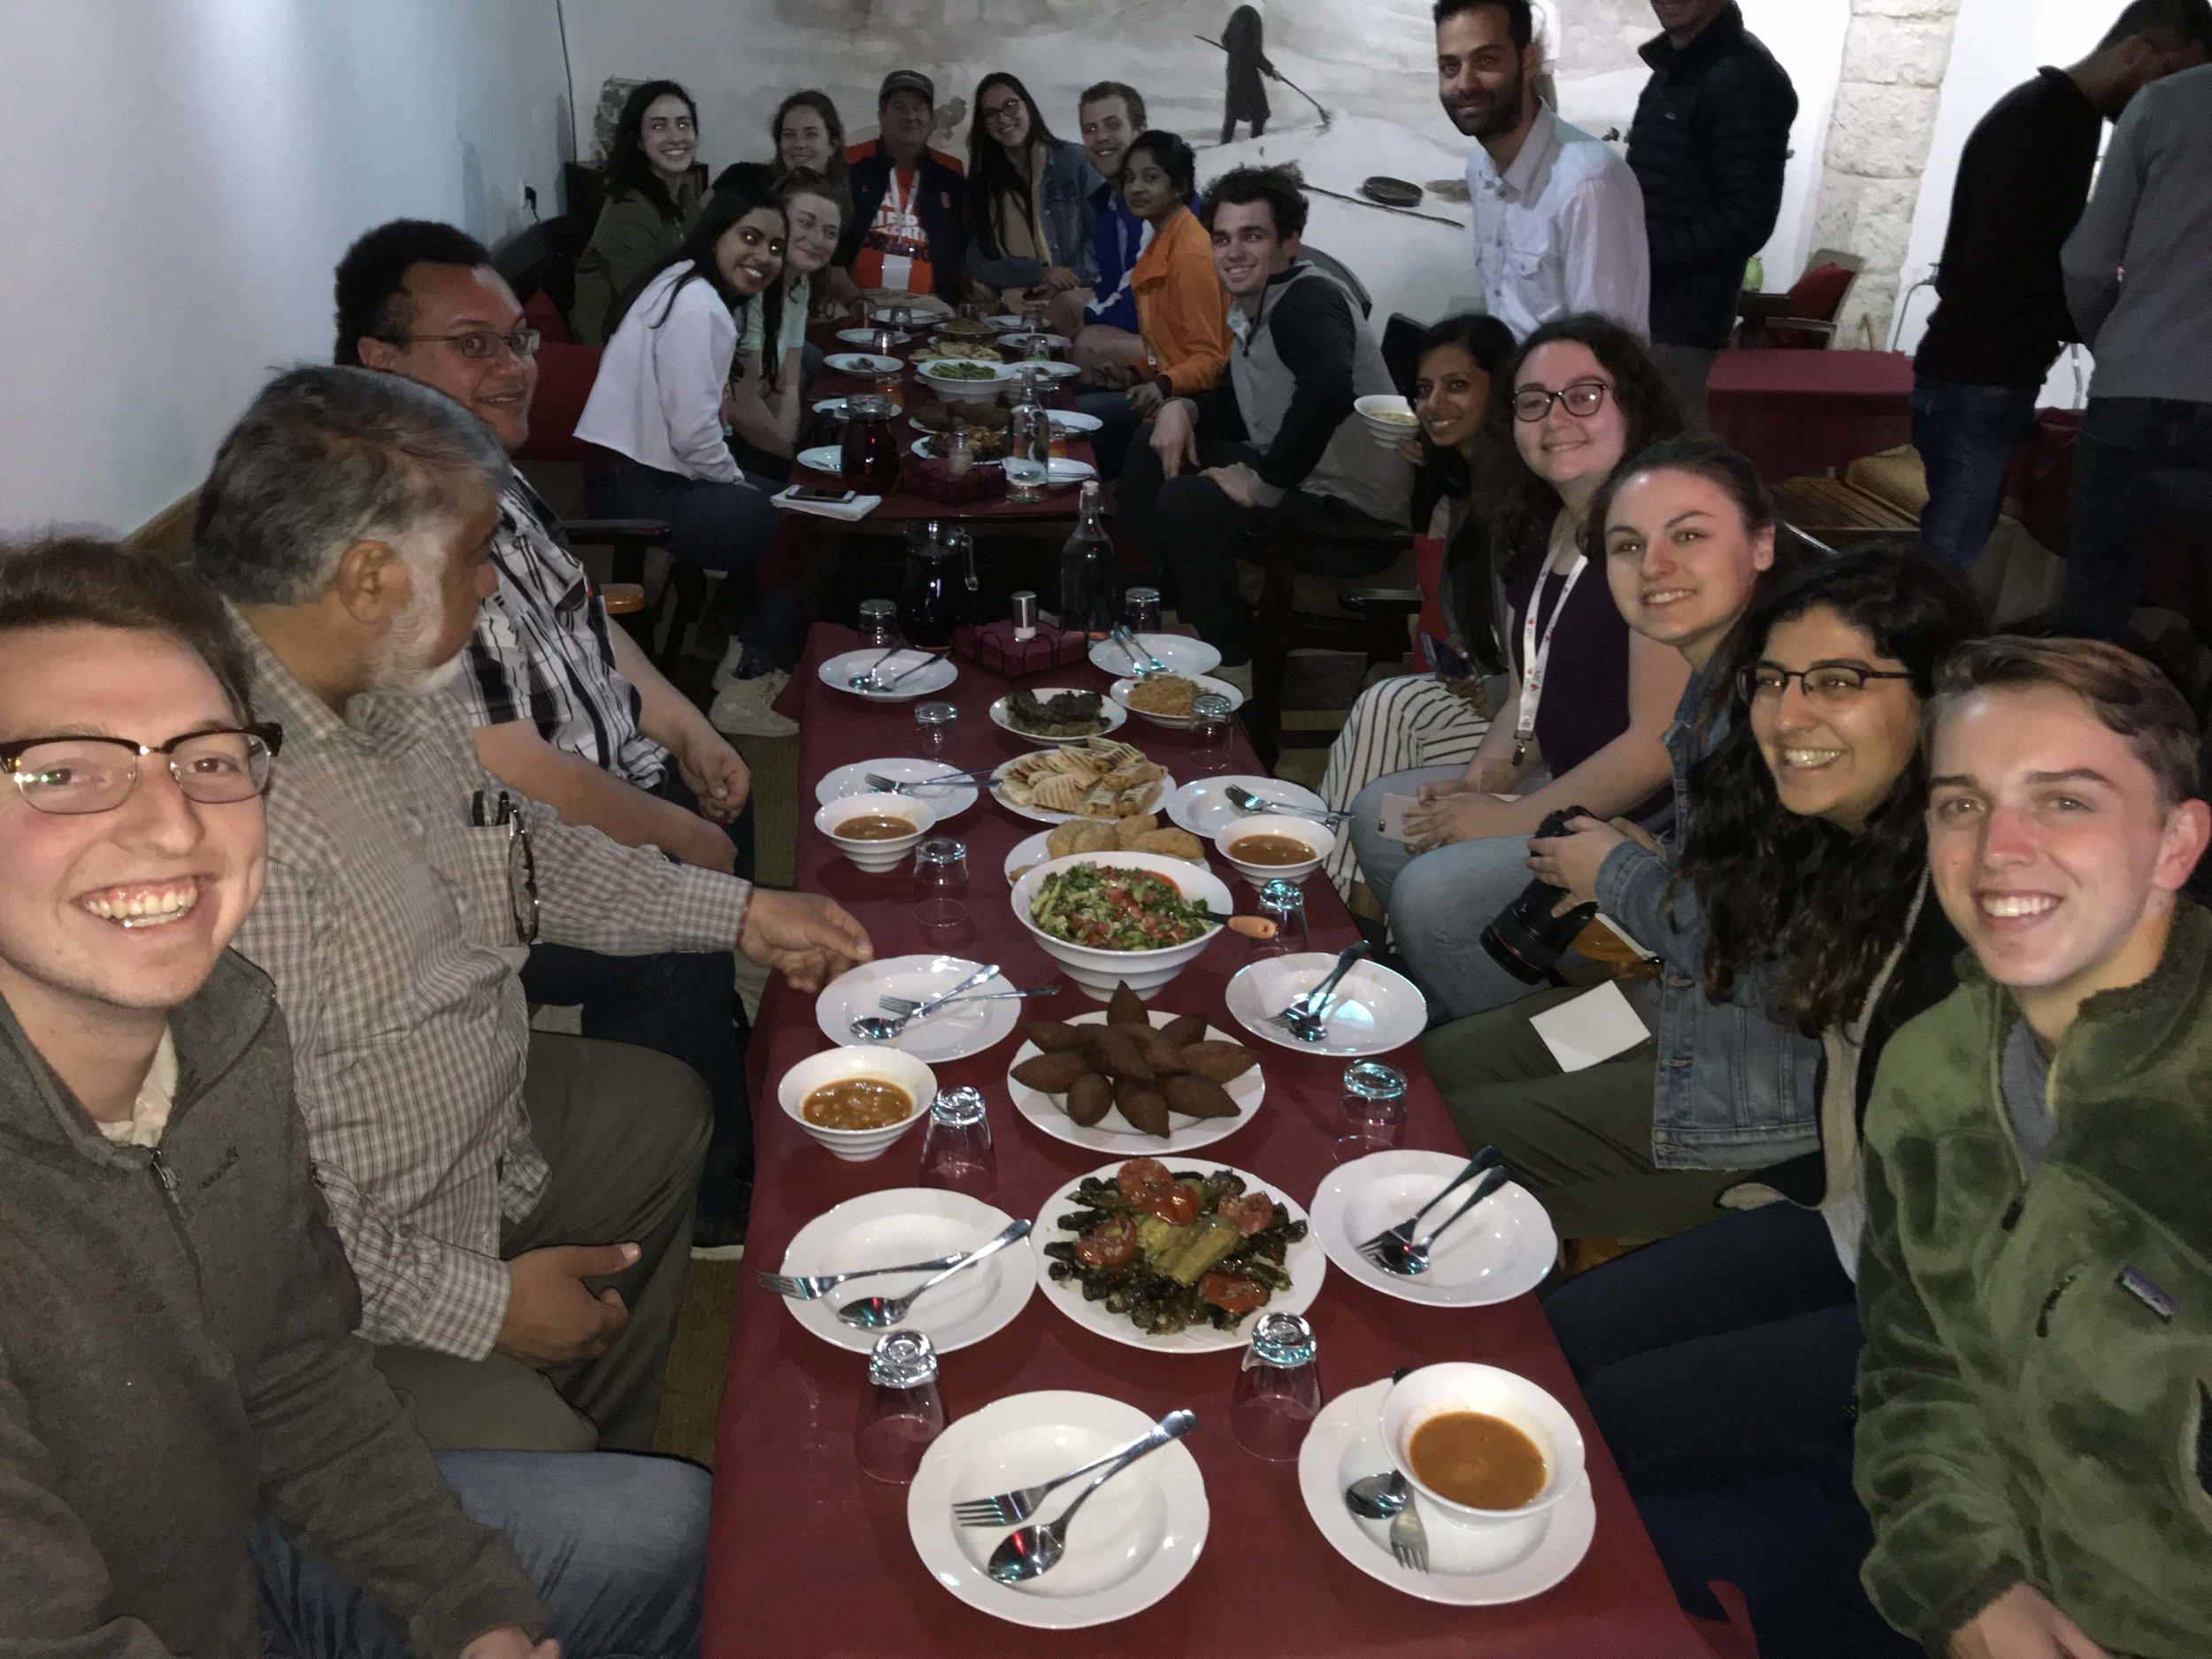 IMG_0825 druze dining lower quality.jpg